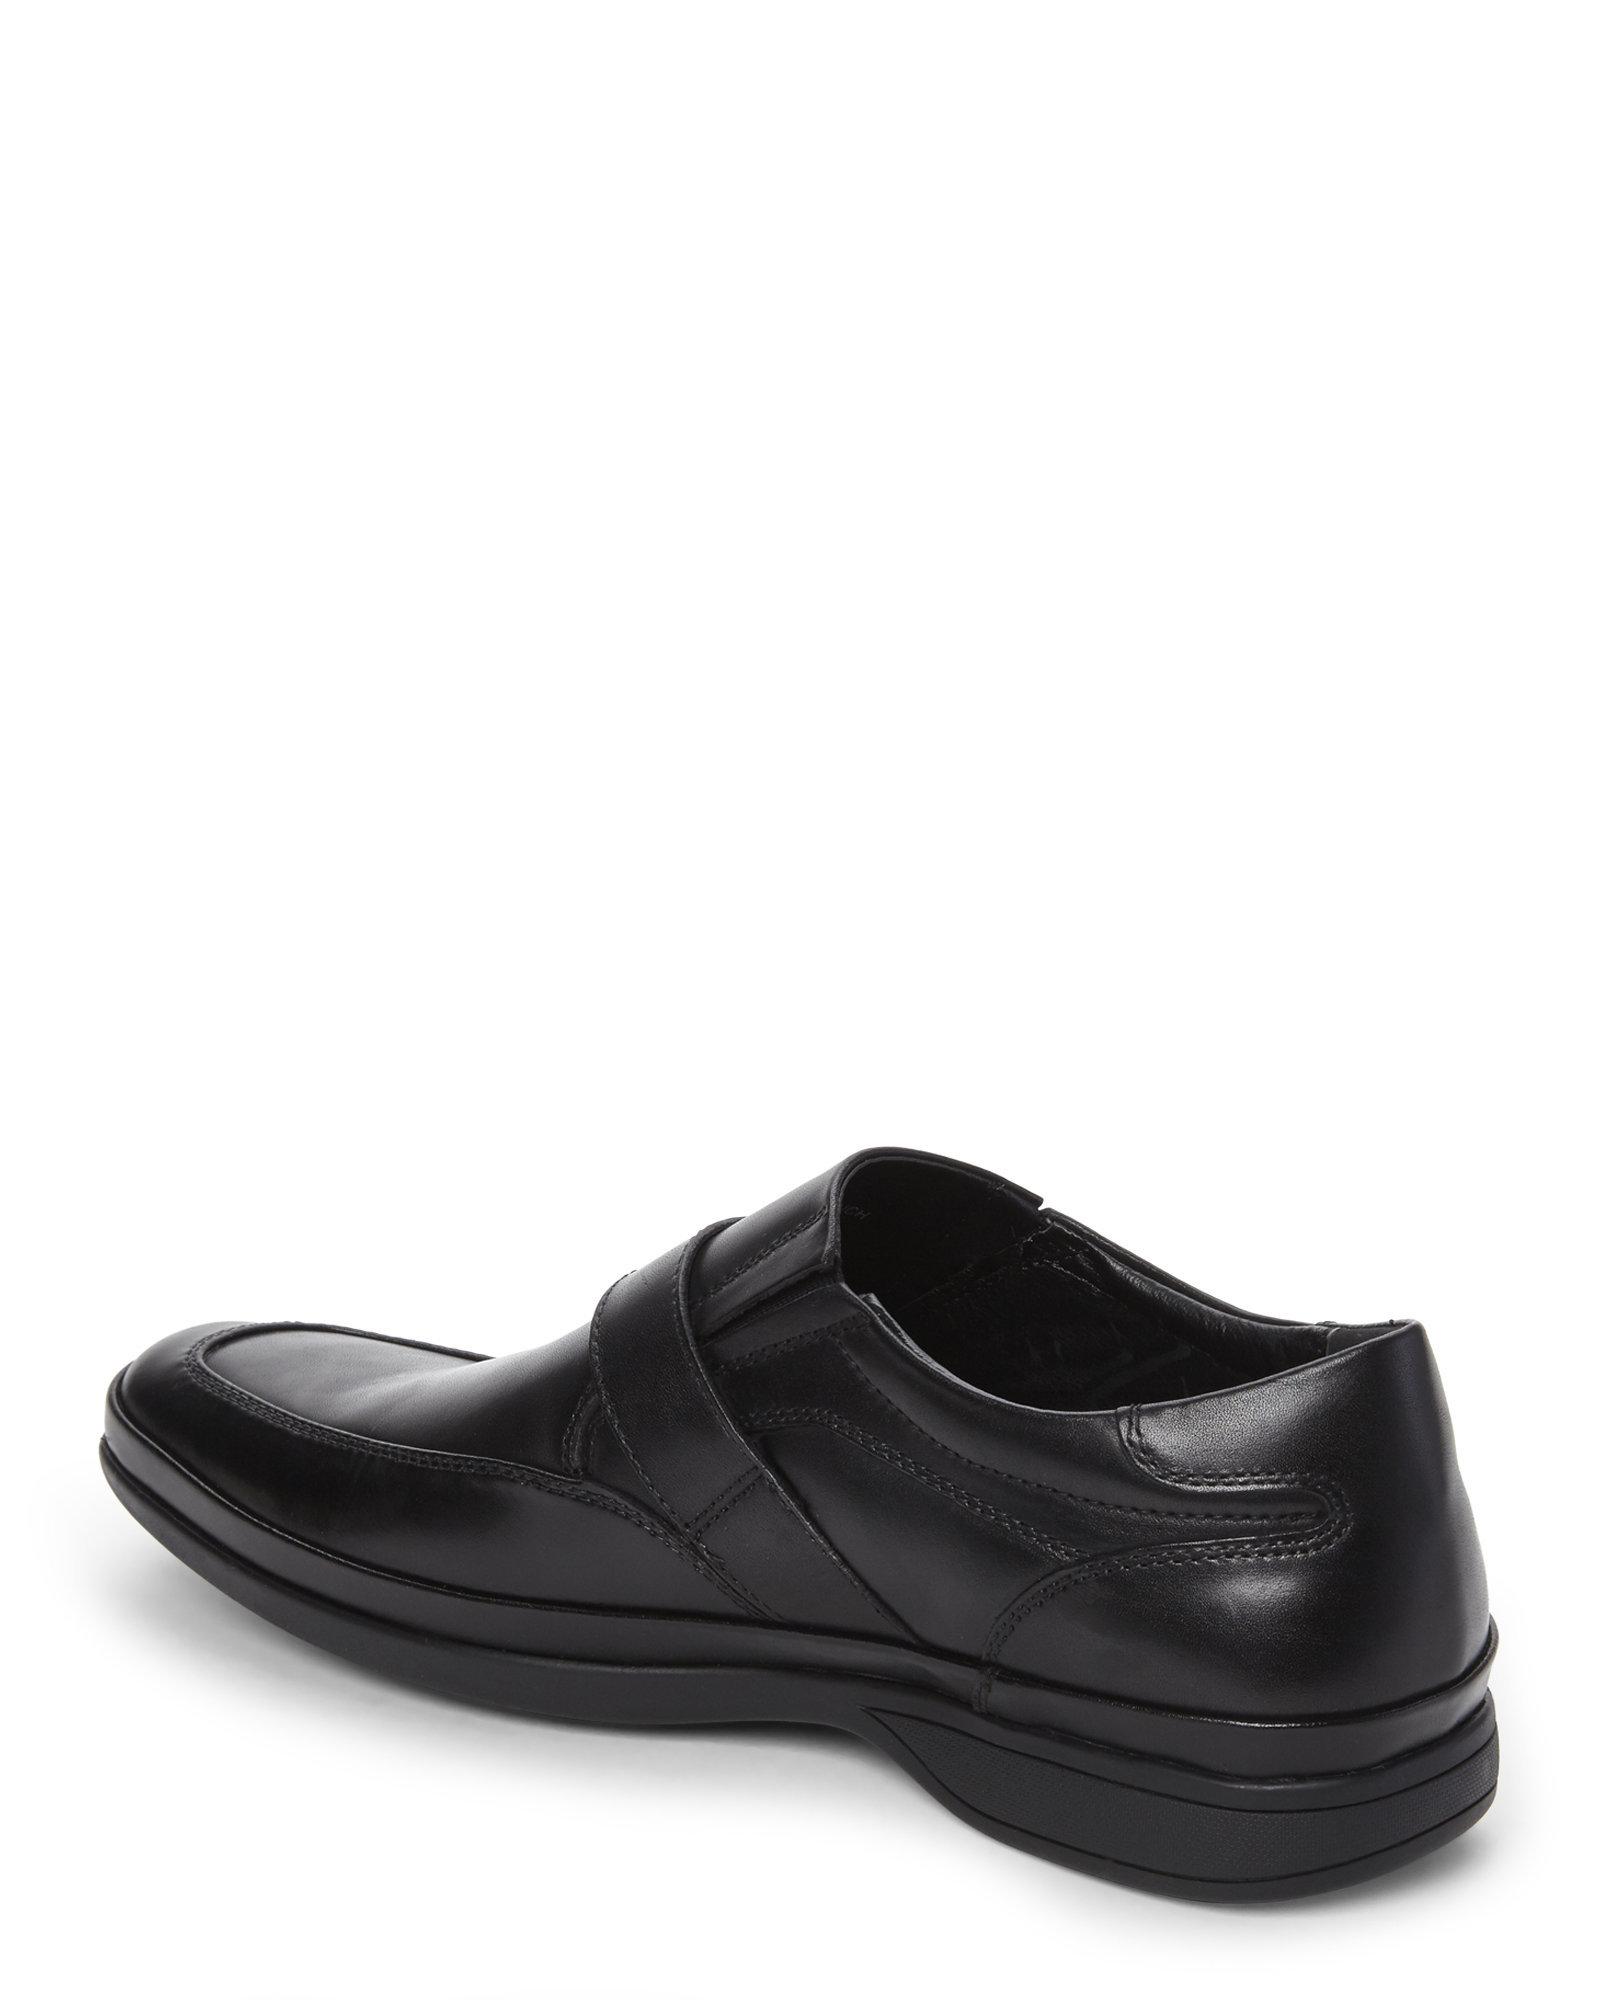 kenneth cole reaction black proud brunch slip on shoes in